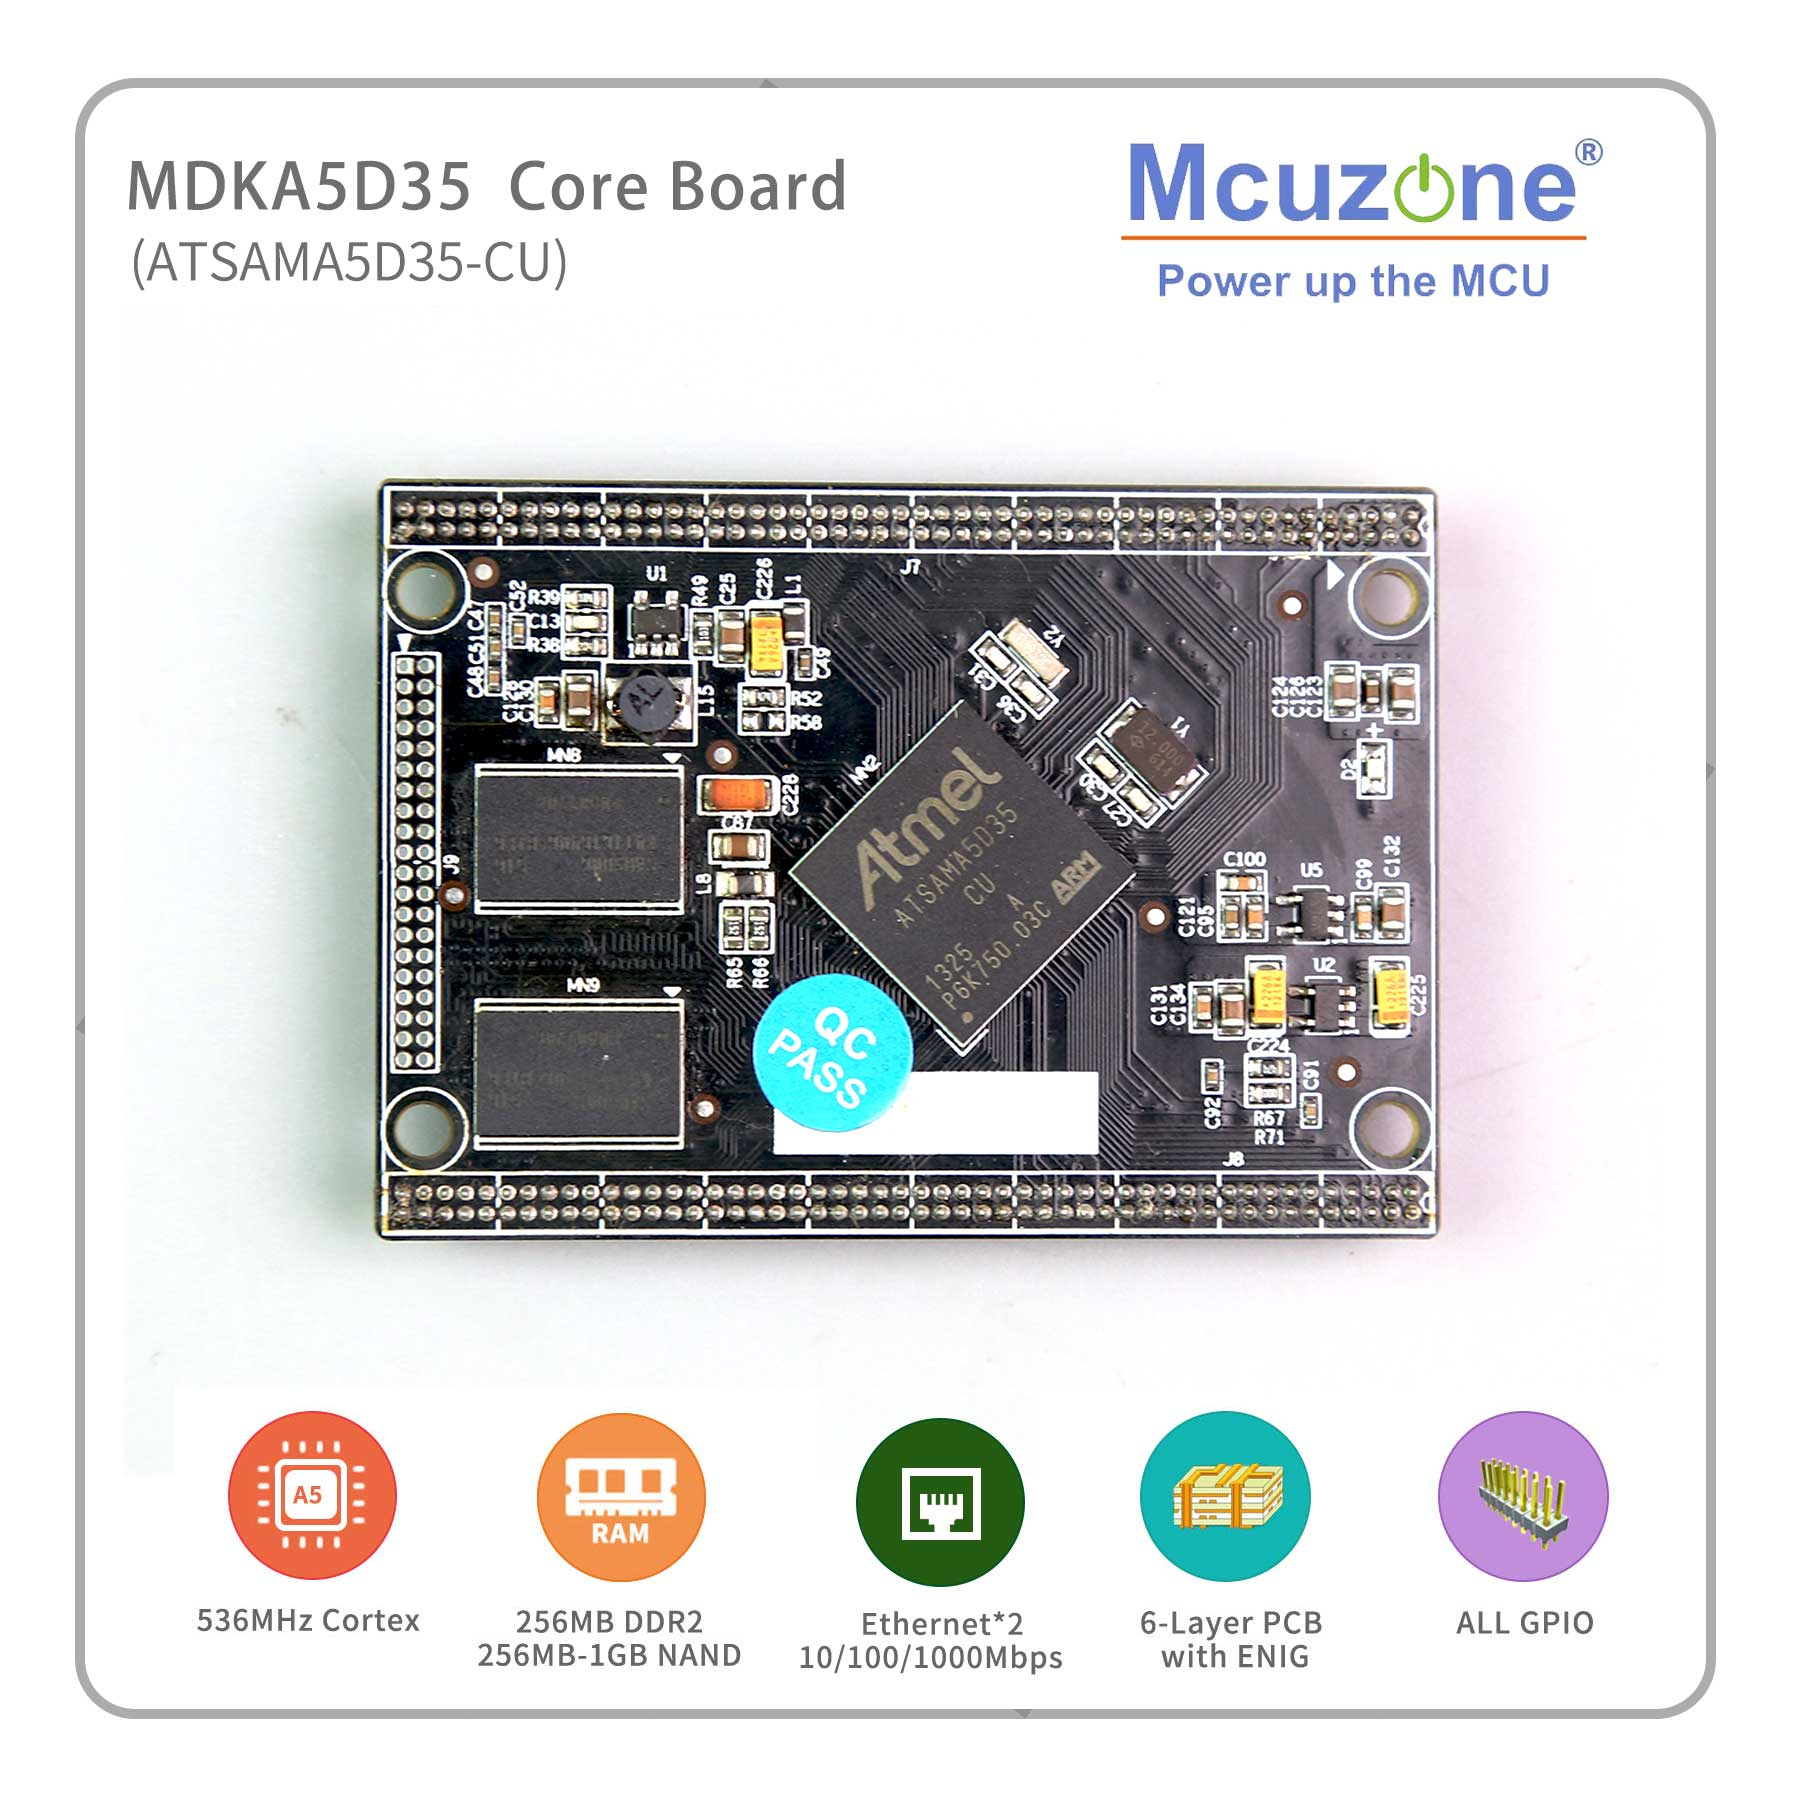 Gigabit Ethernet , ATSAMA5D35, A5D35, MDKA5D35 Core Board, 536MHz Cortex-A5 CPU, 256MB DDR2,256M NAND, 4USART+2UART